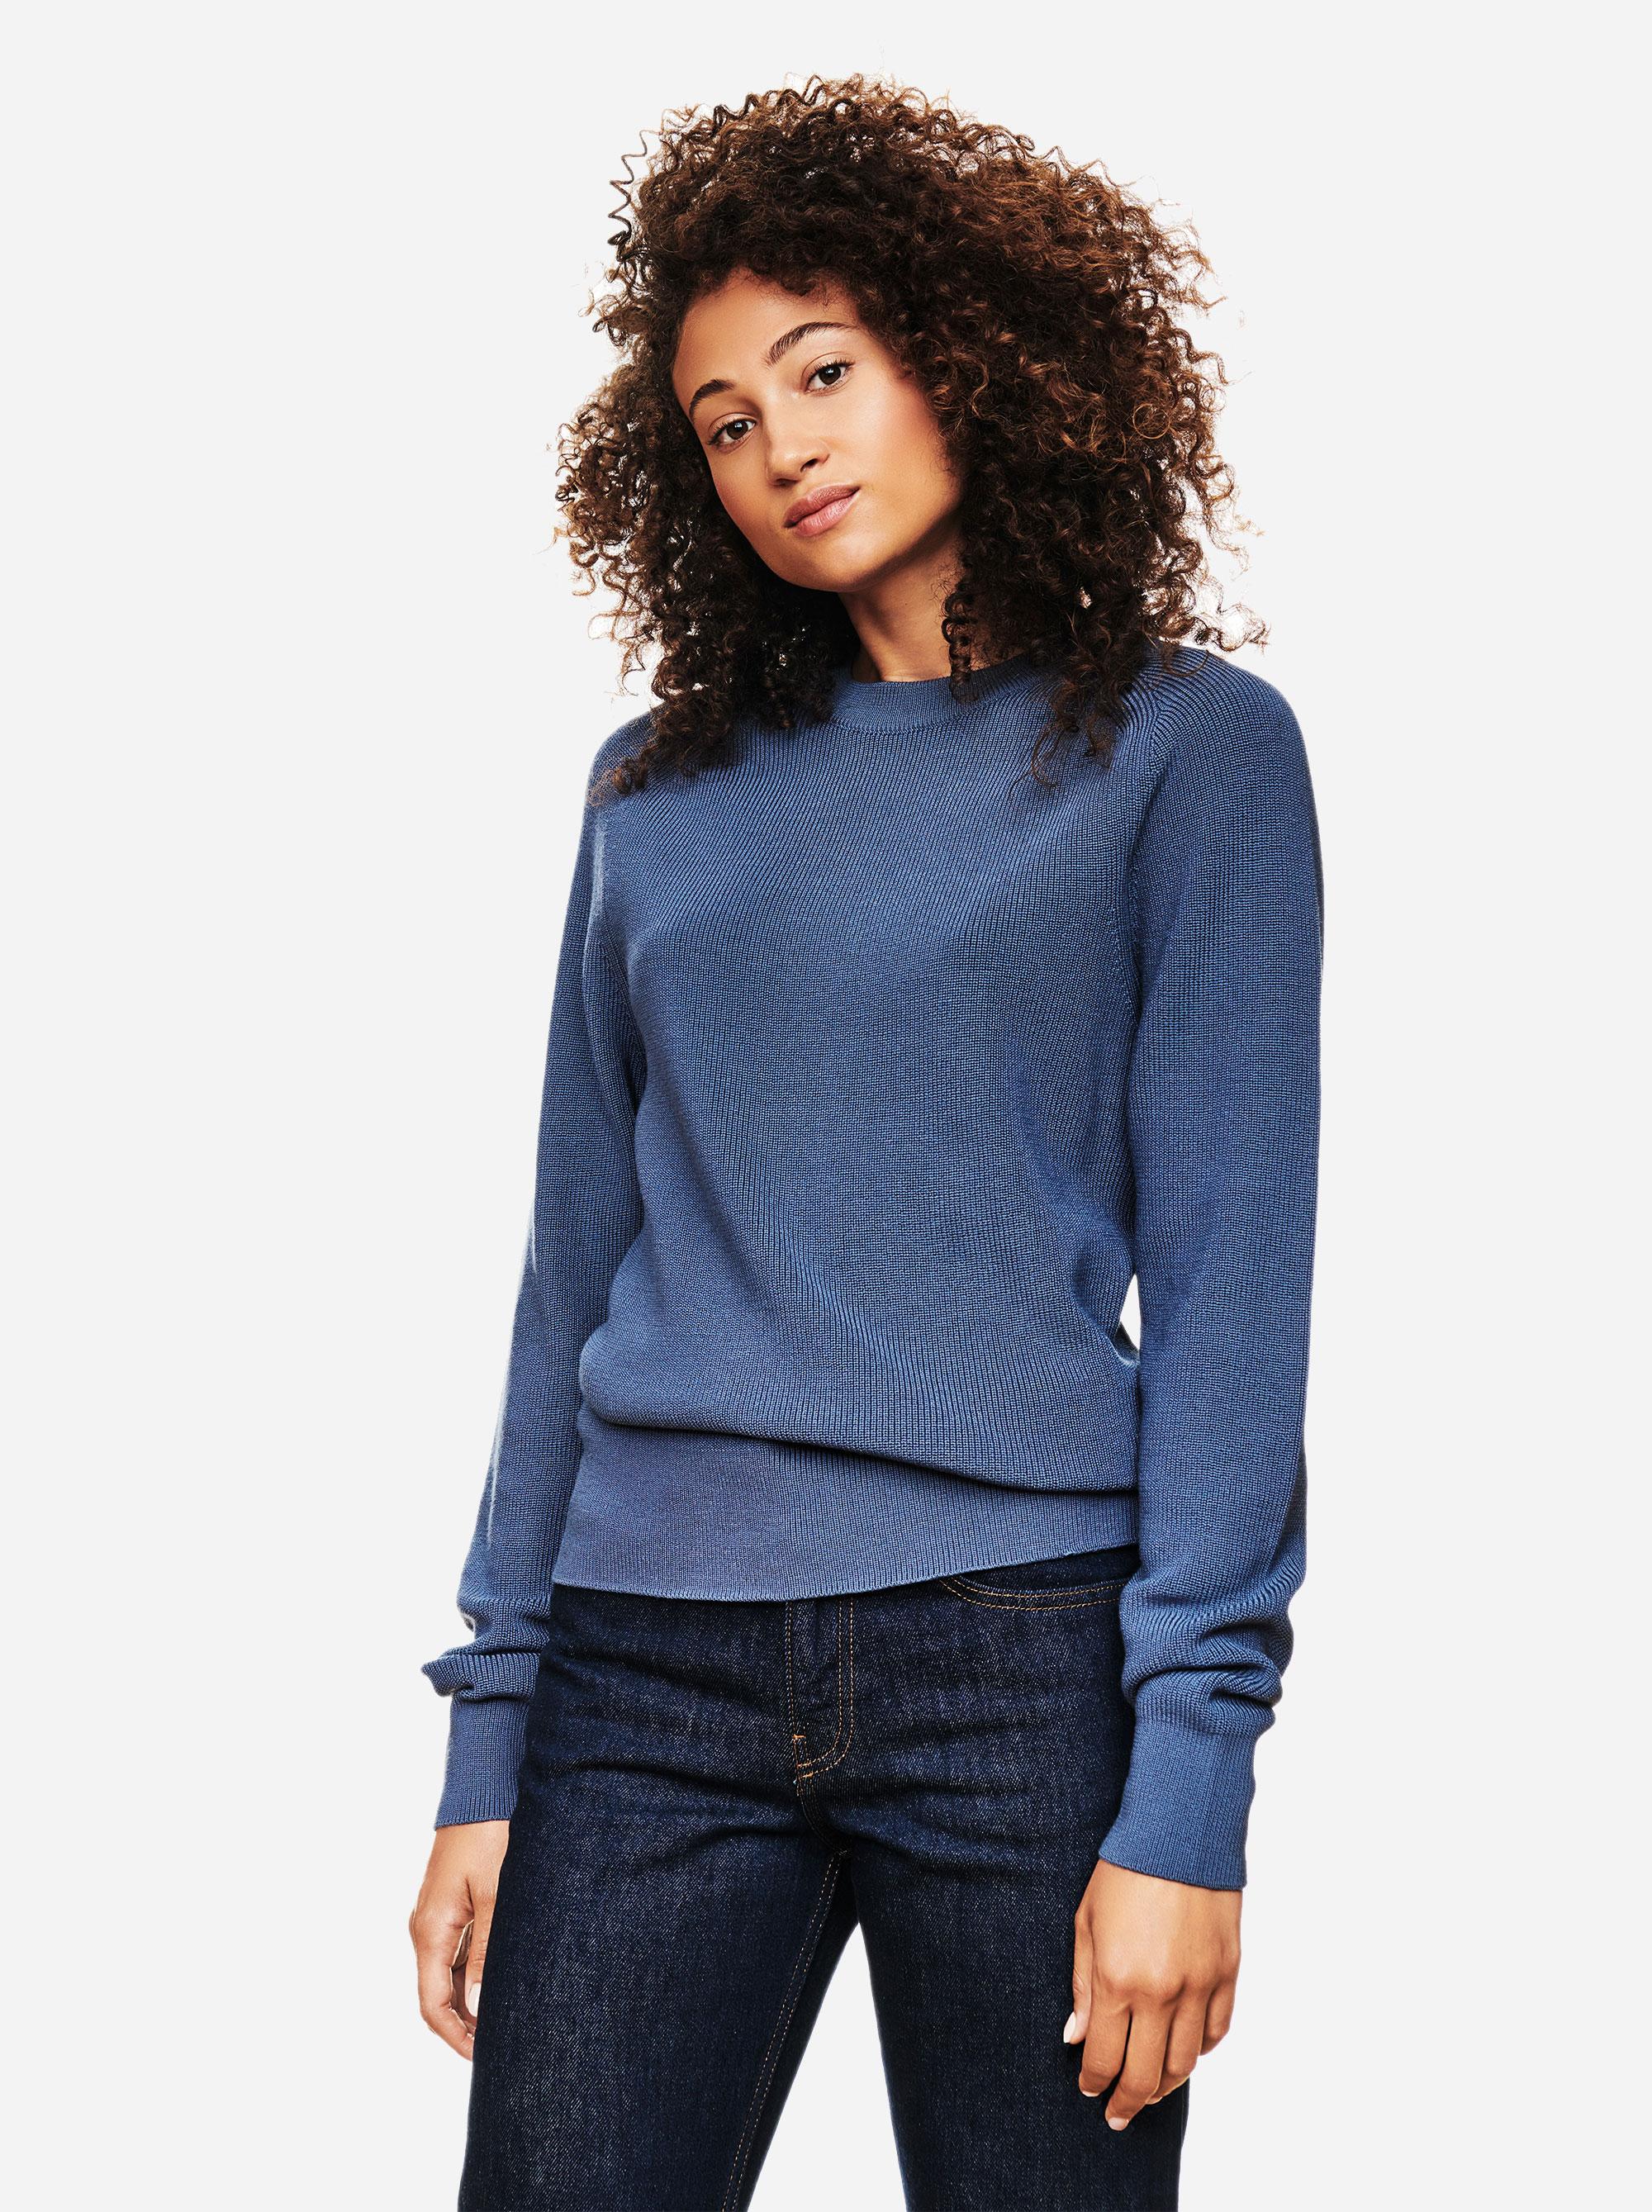 Teym - Crewneck - The Merino Sweater - Women - Sky blue - 1